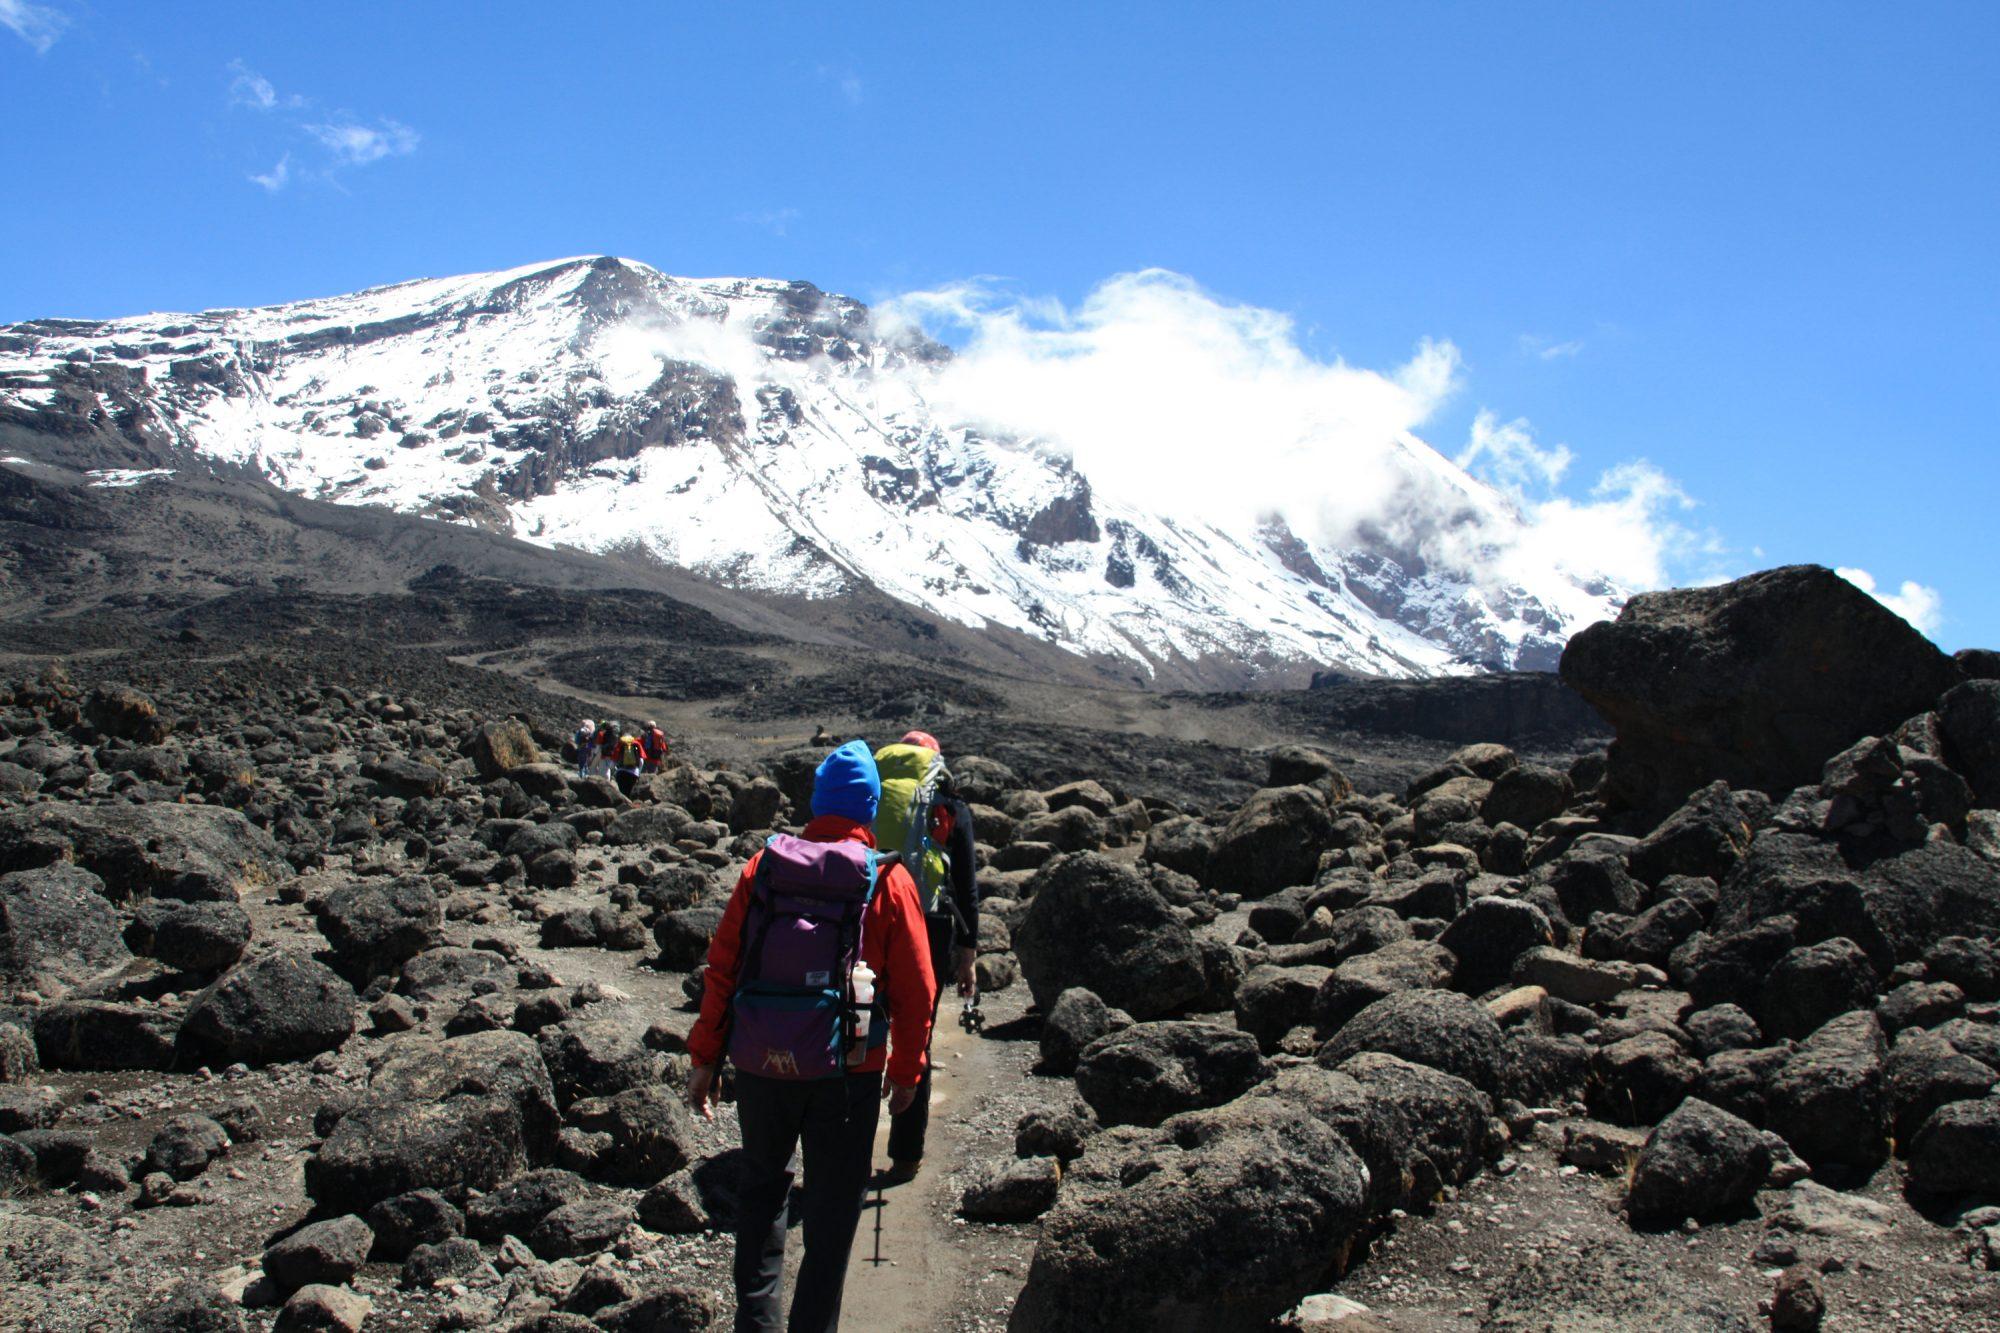 Lavawüste, Kilimandscharo, Kilimandscharo besteigen, Tansania, Afrika, Kilimandscharo Tour, Erfahrungsbericht, Machame Route